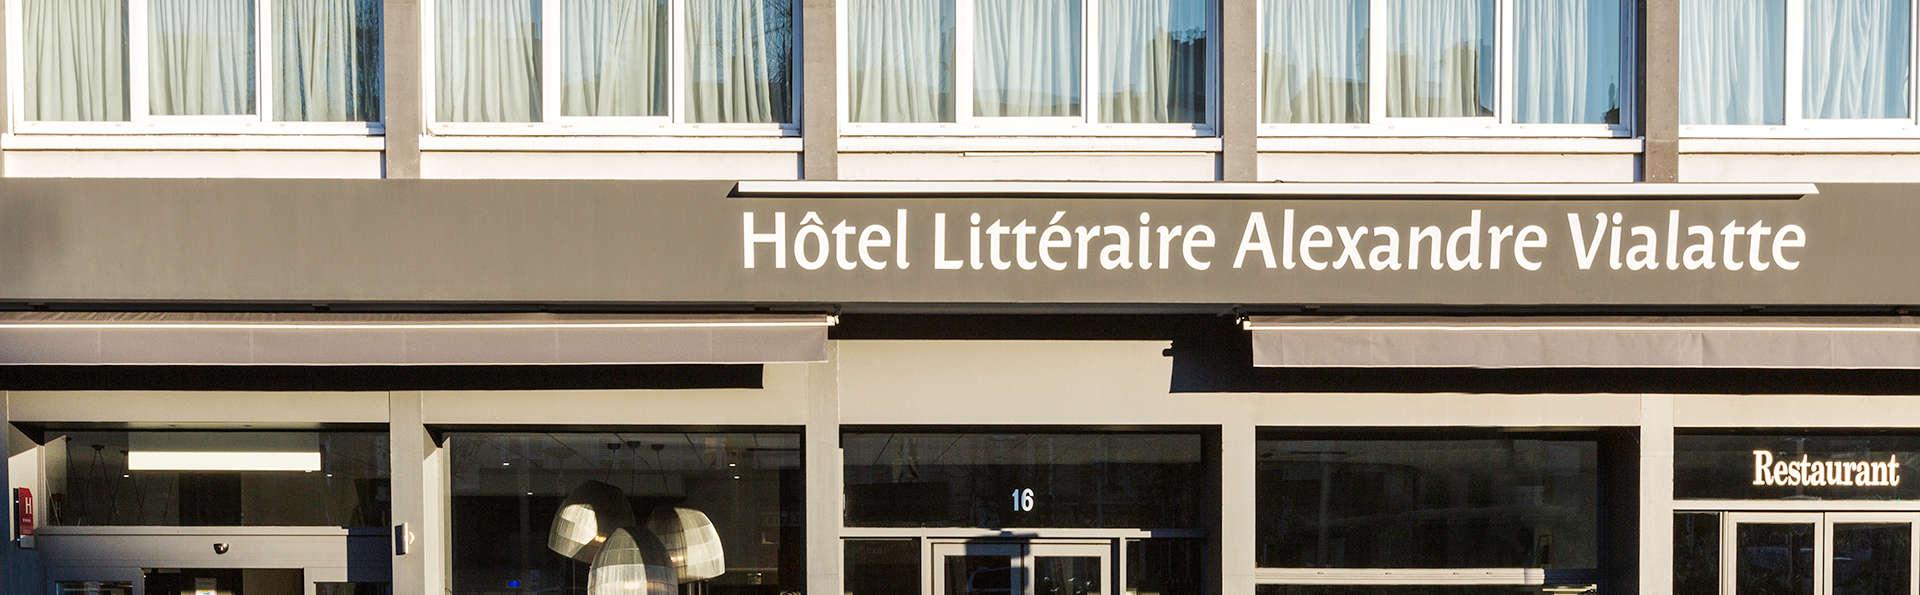 Best Western Plus Hôtel Littéraire Alexandre Vialatte - EDIT_front.jpg